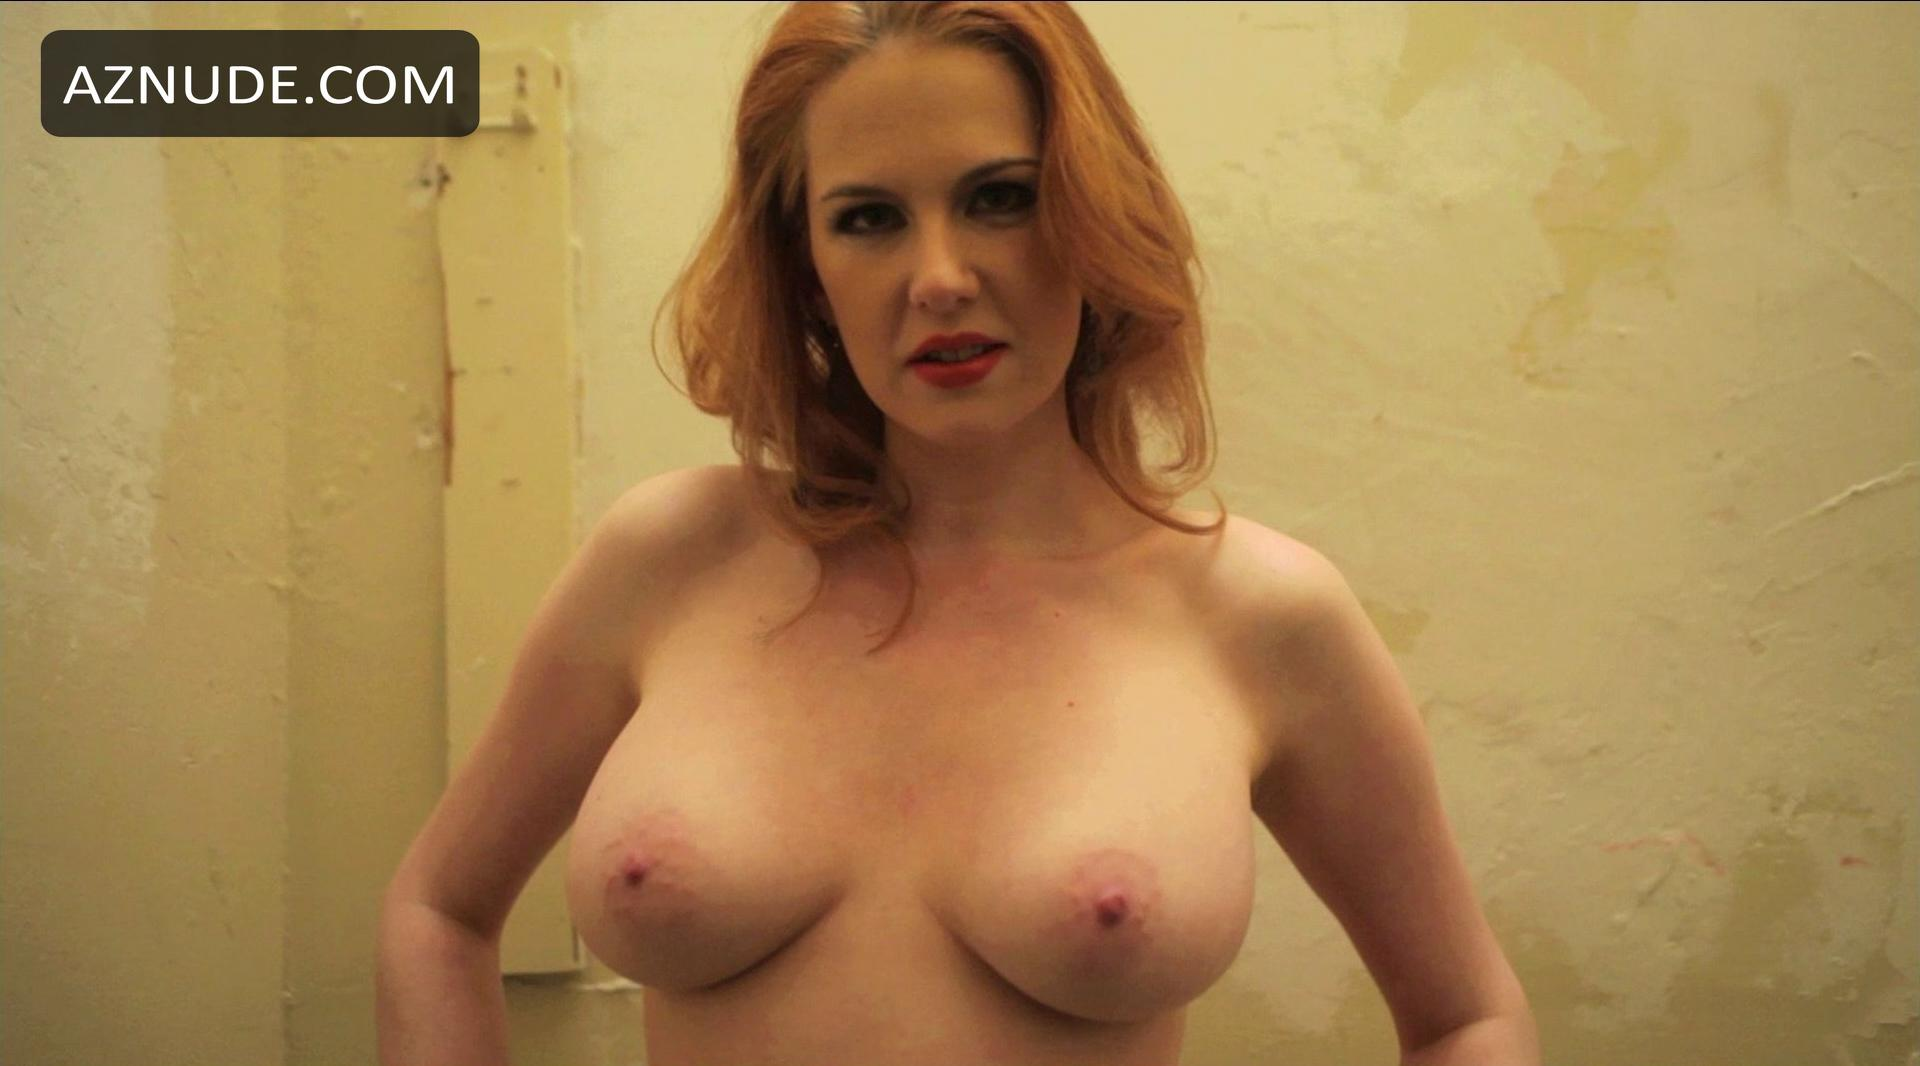 Adult archive elizabeth perkins nude thumbs